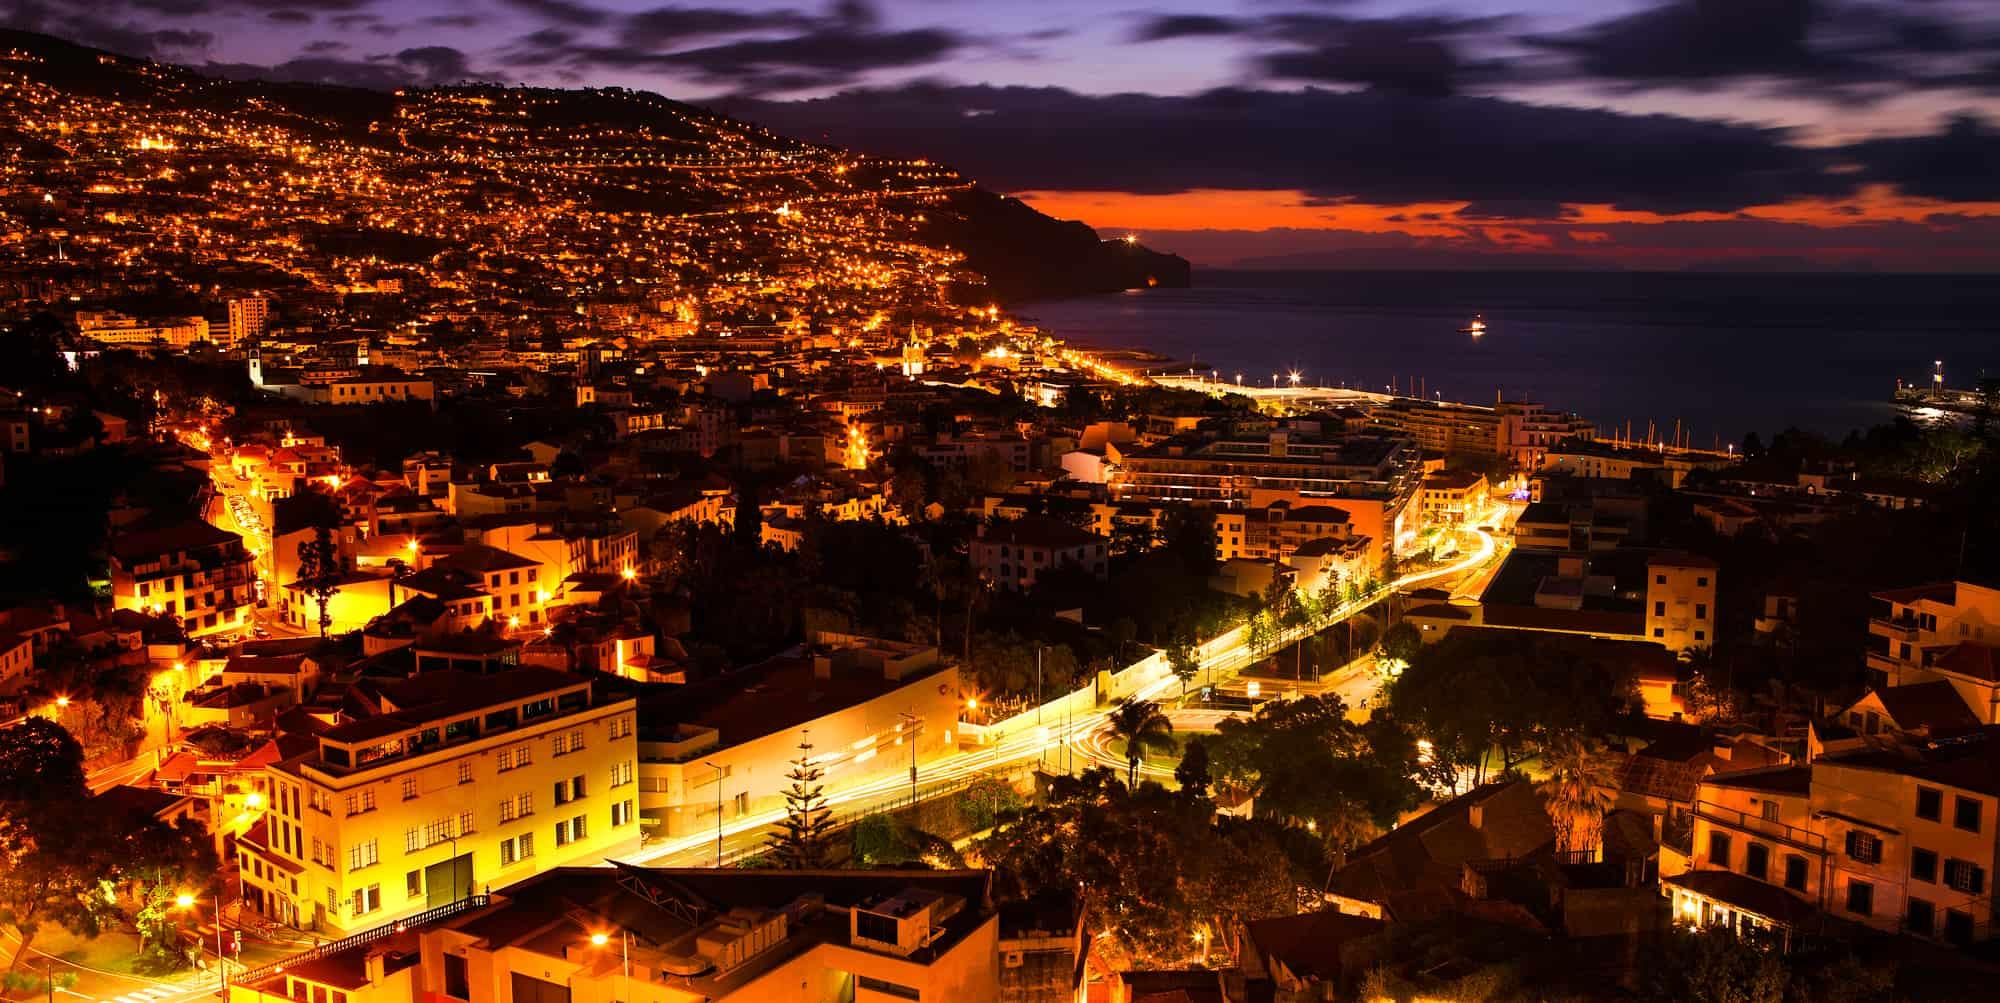 Funchal bij Zonsopgang, Madeira, Portugal